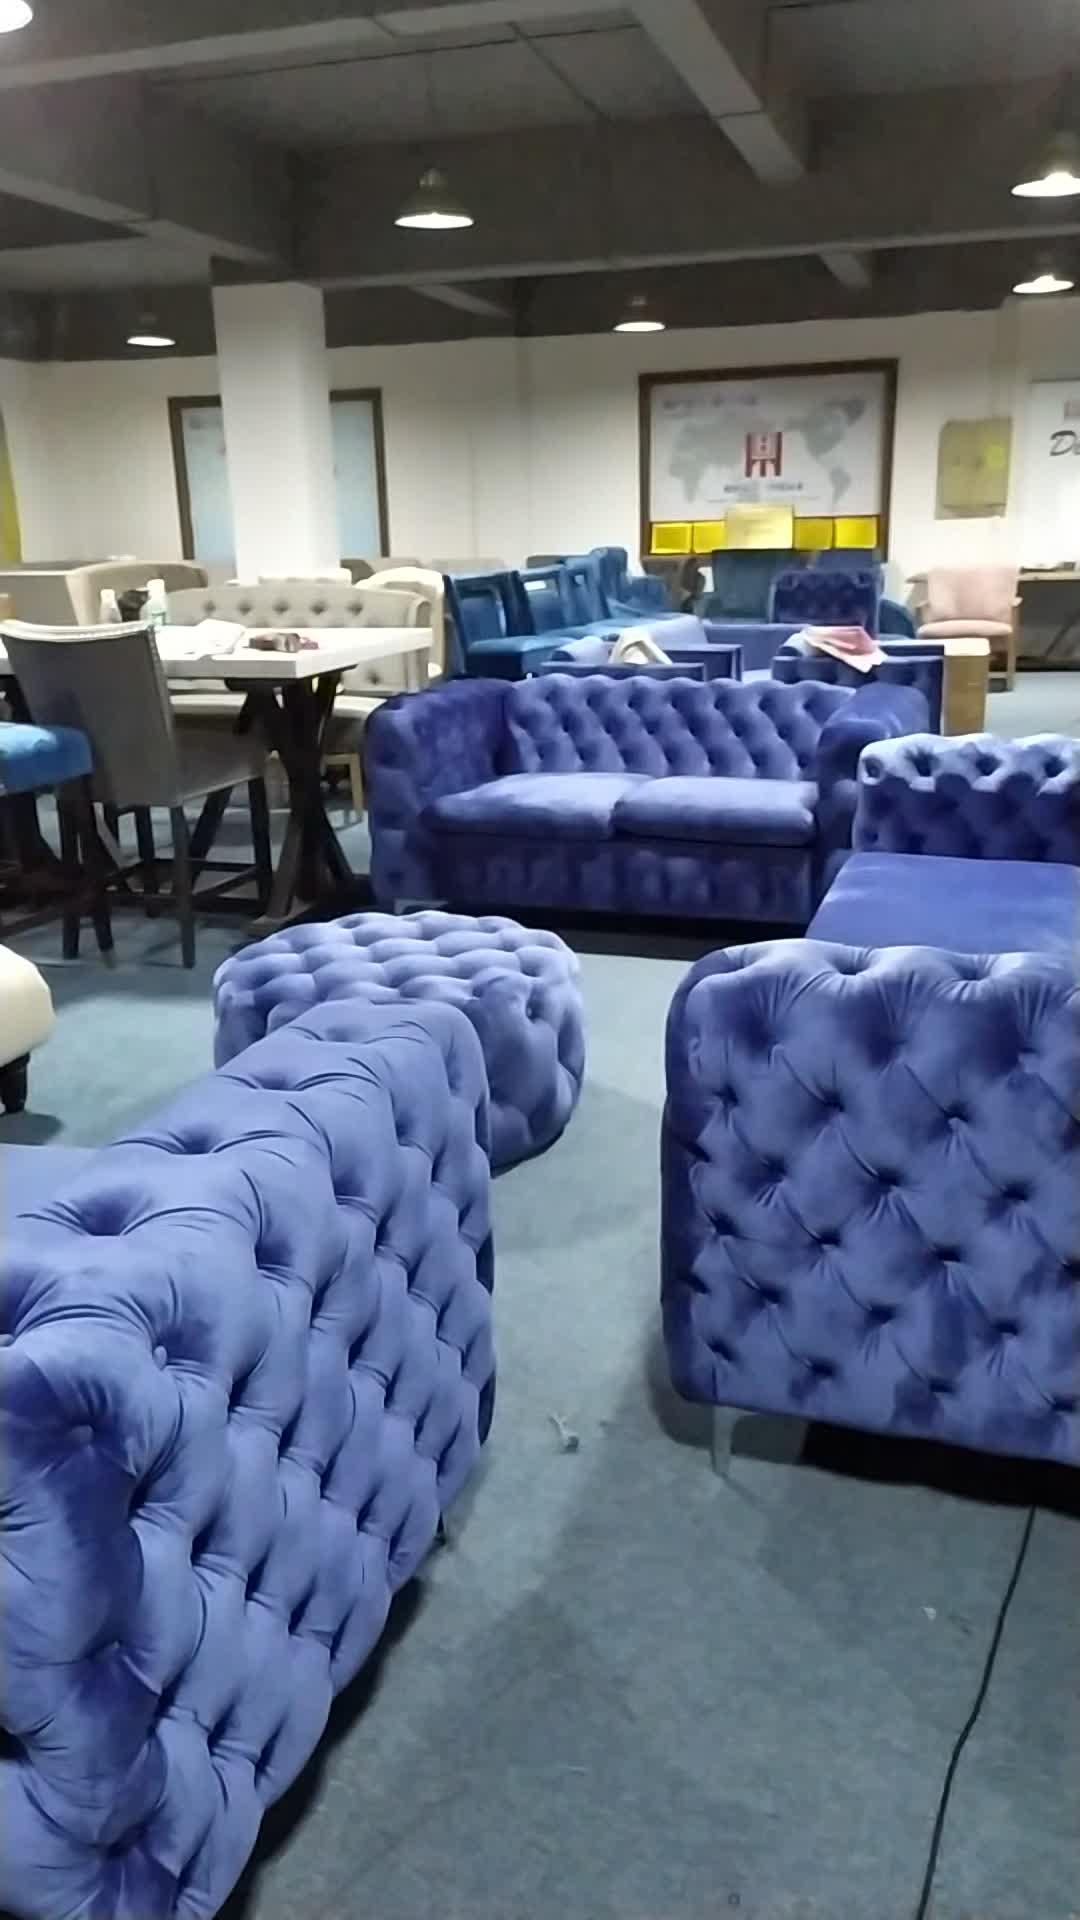 16 jaar fabriek modern design luxe meubels stof sets couch woonkamer slaapbank fabrikant